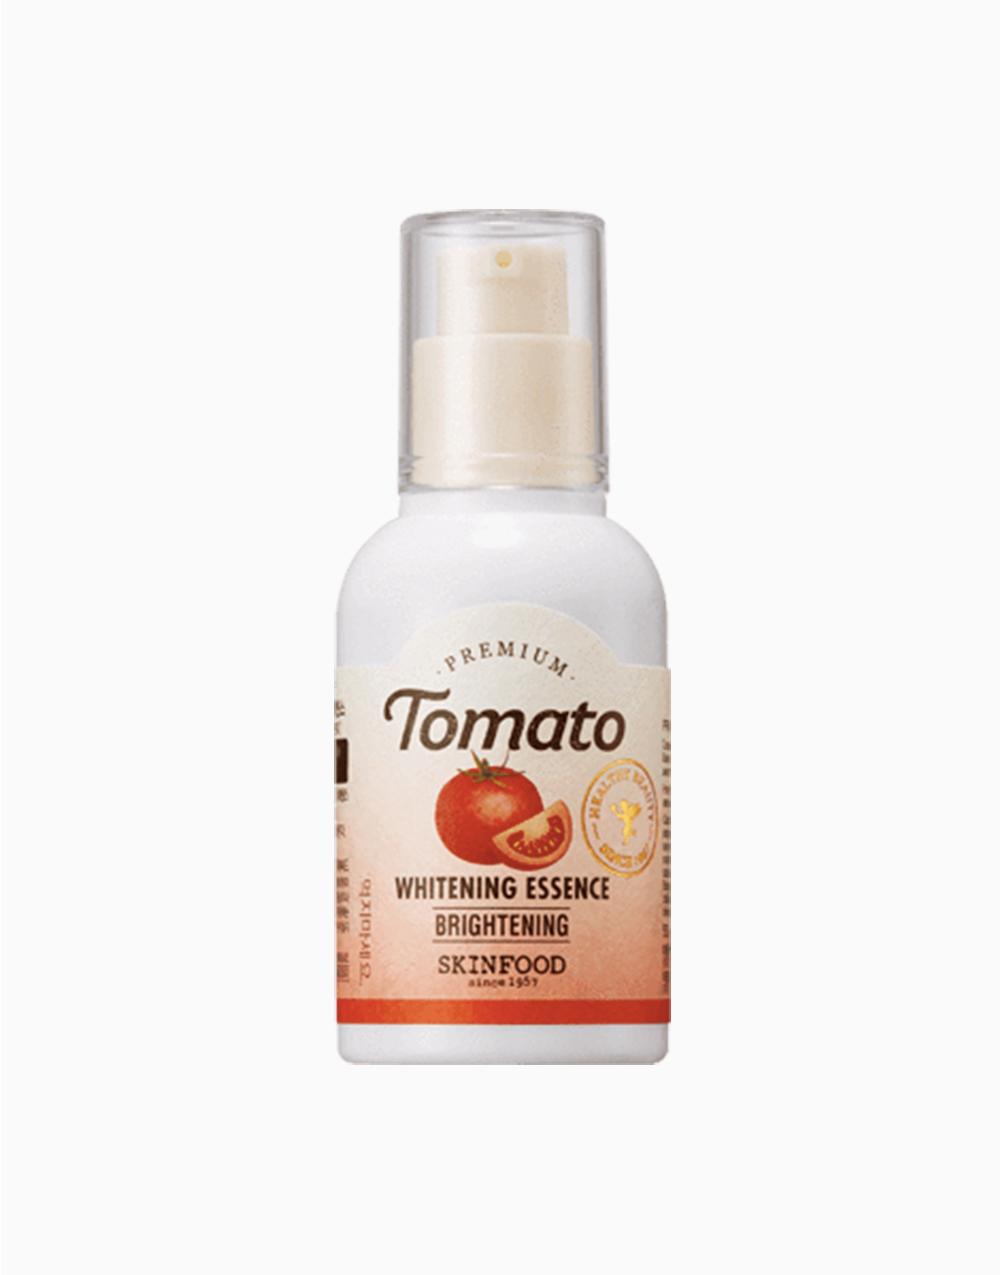 Premium Tomato Whitening Essence by Skinfood